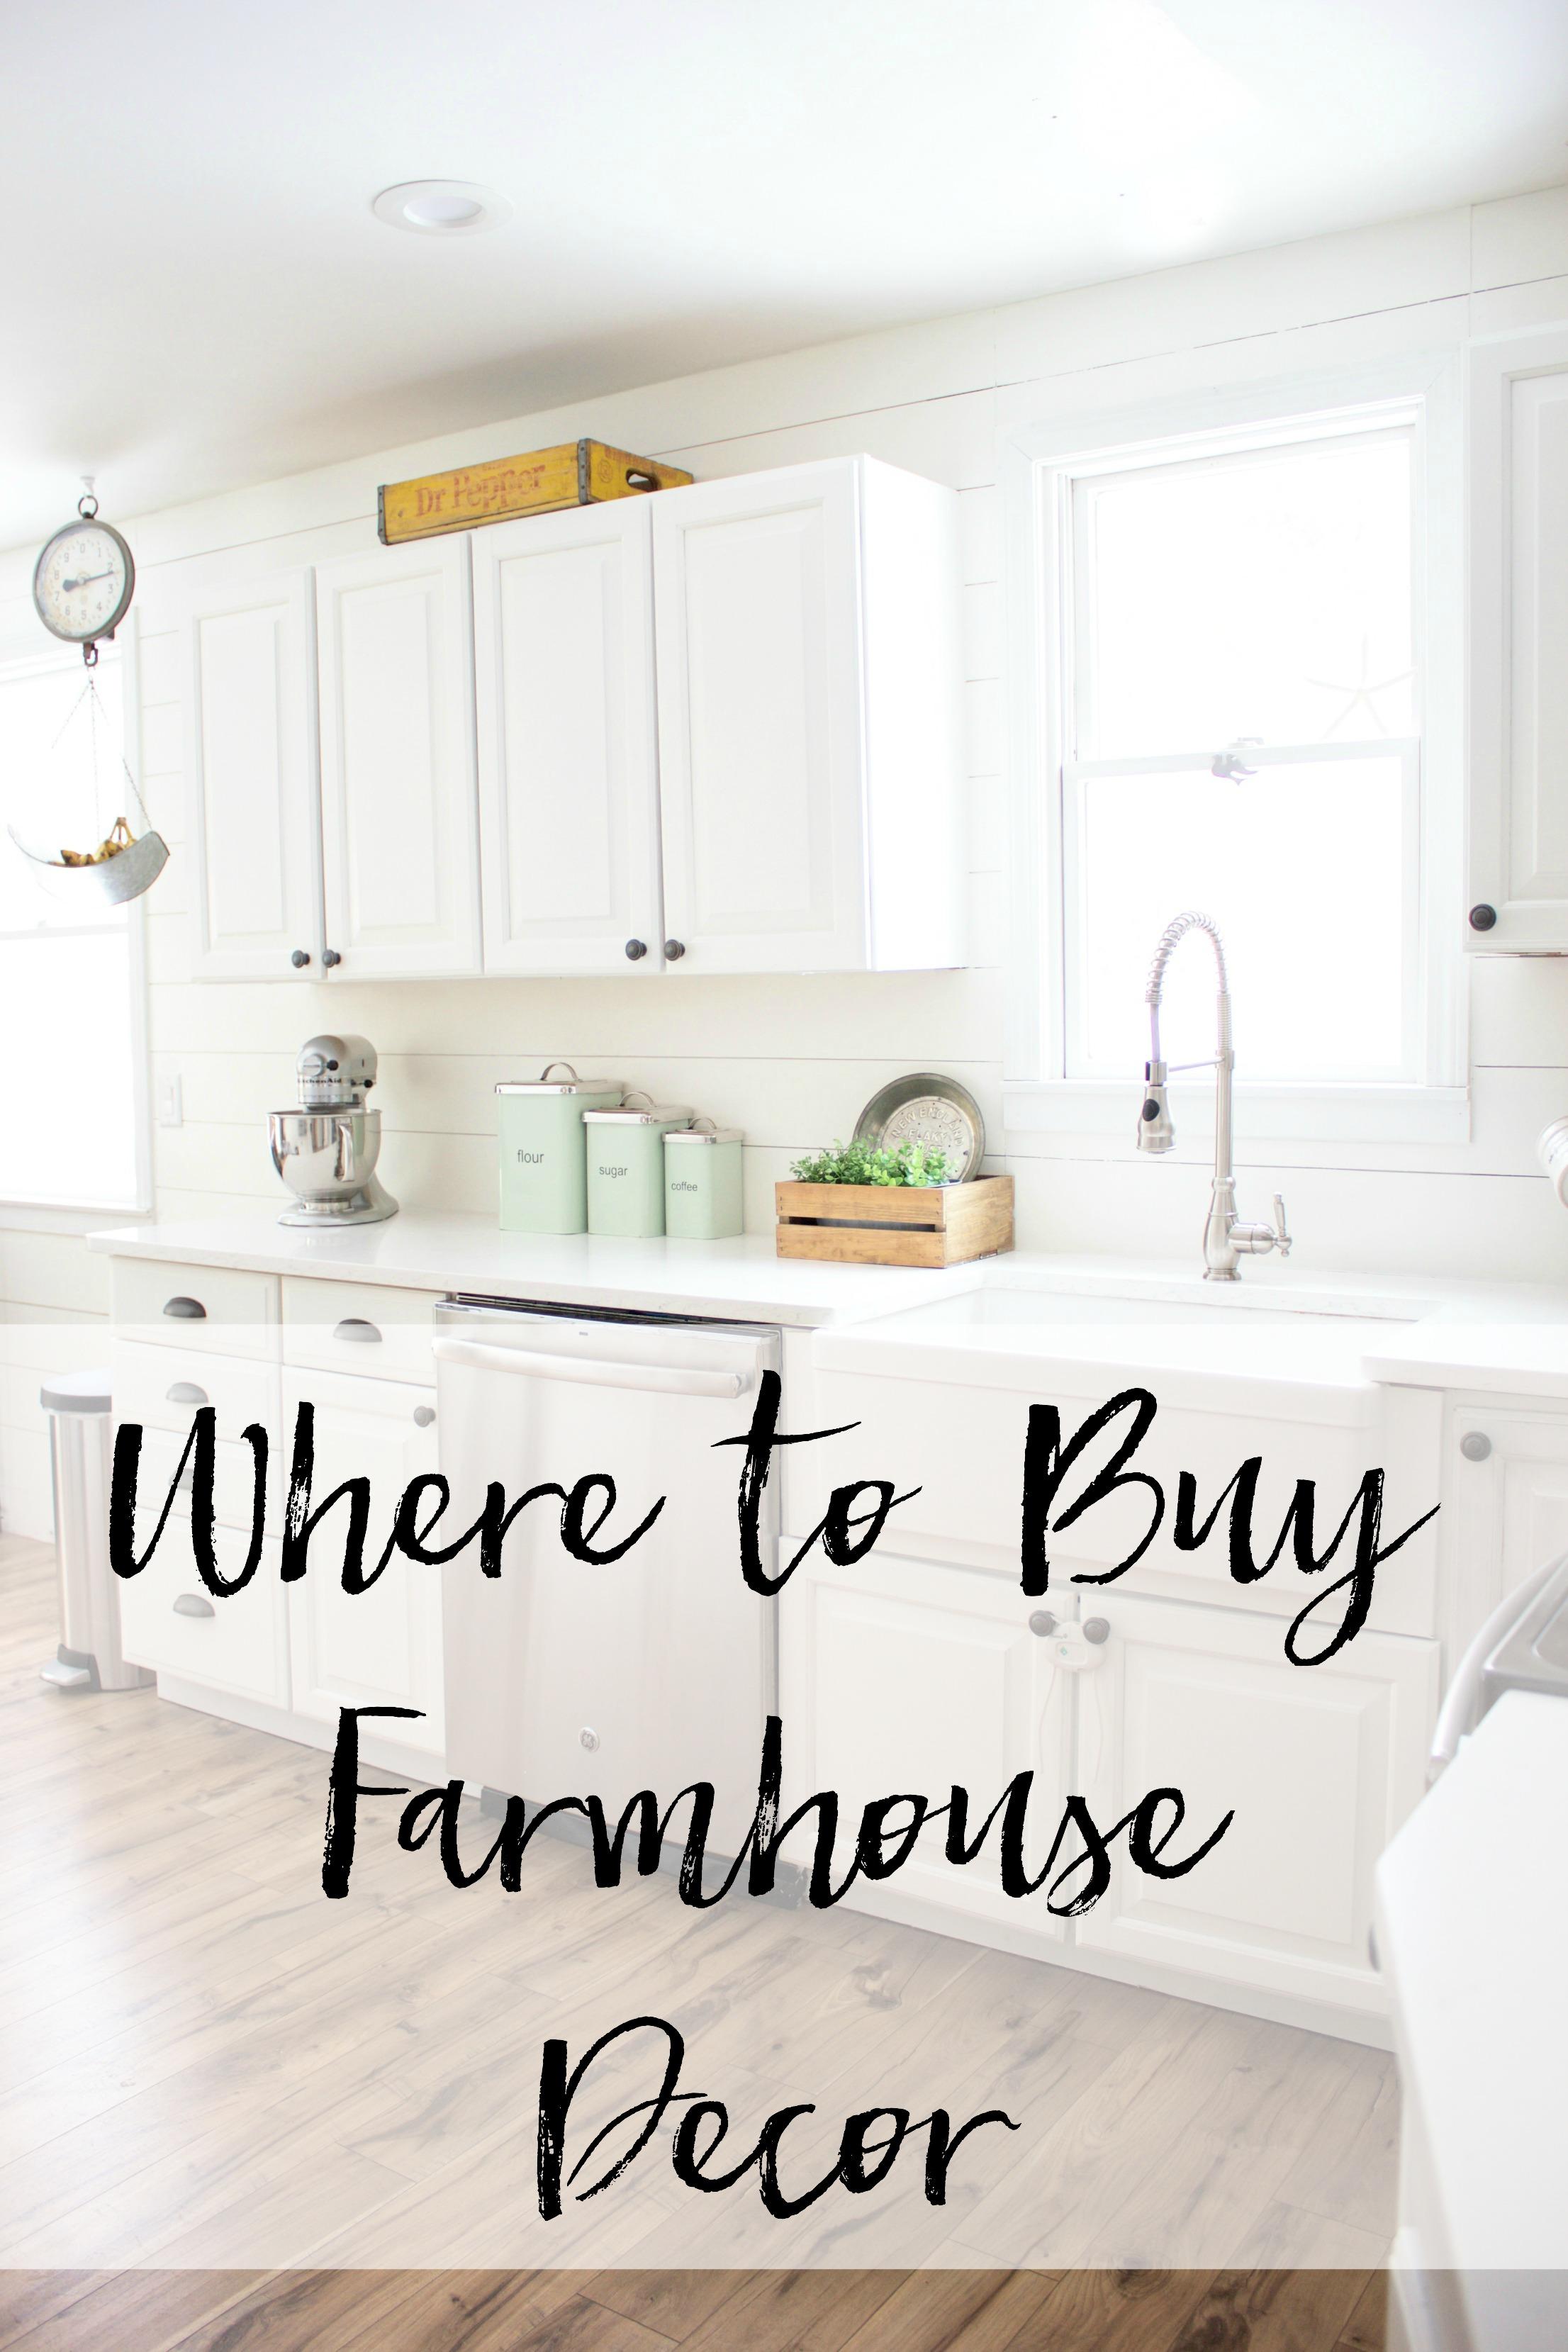 Where To Buy Farmhouse Decor  ||  A list of shops of where to buy farmhouse decor items for your home!